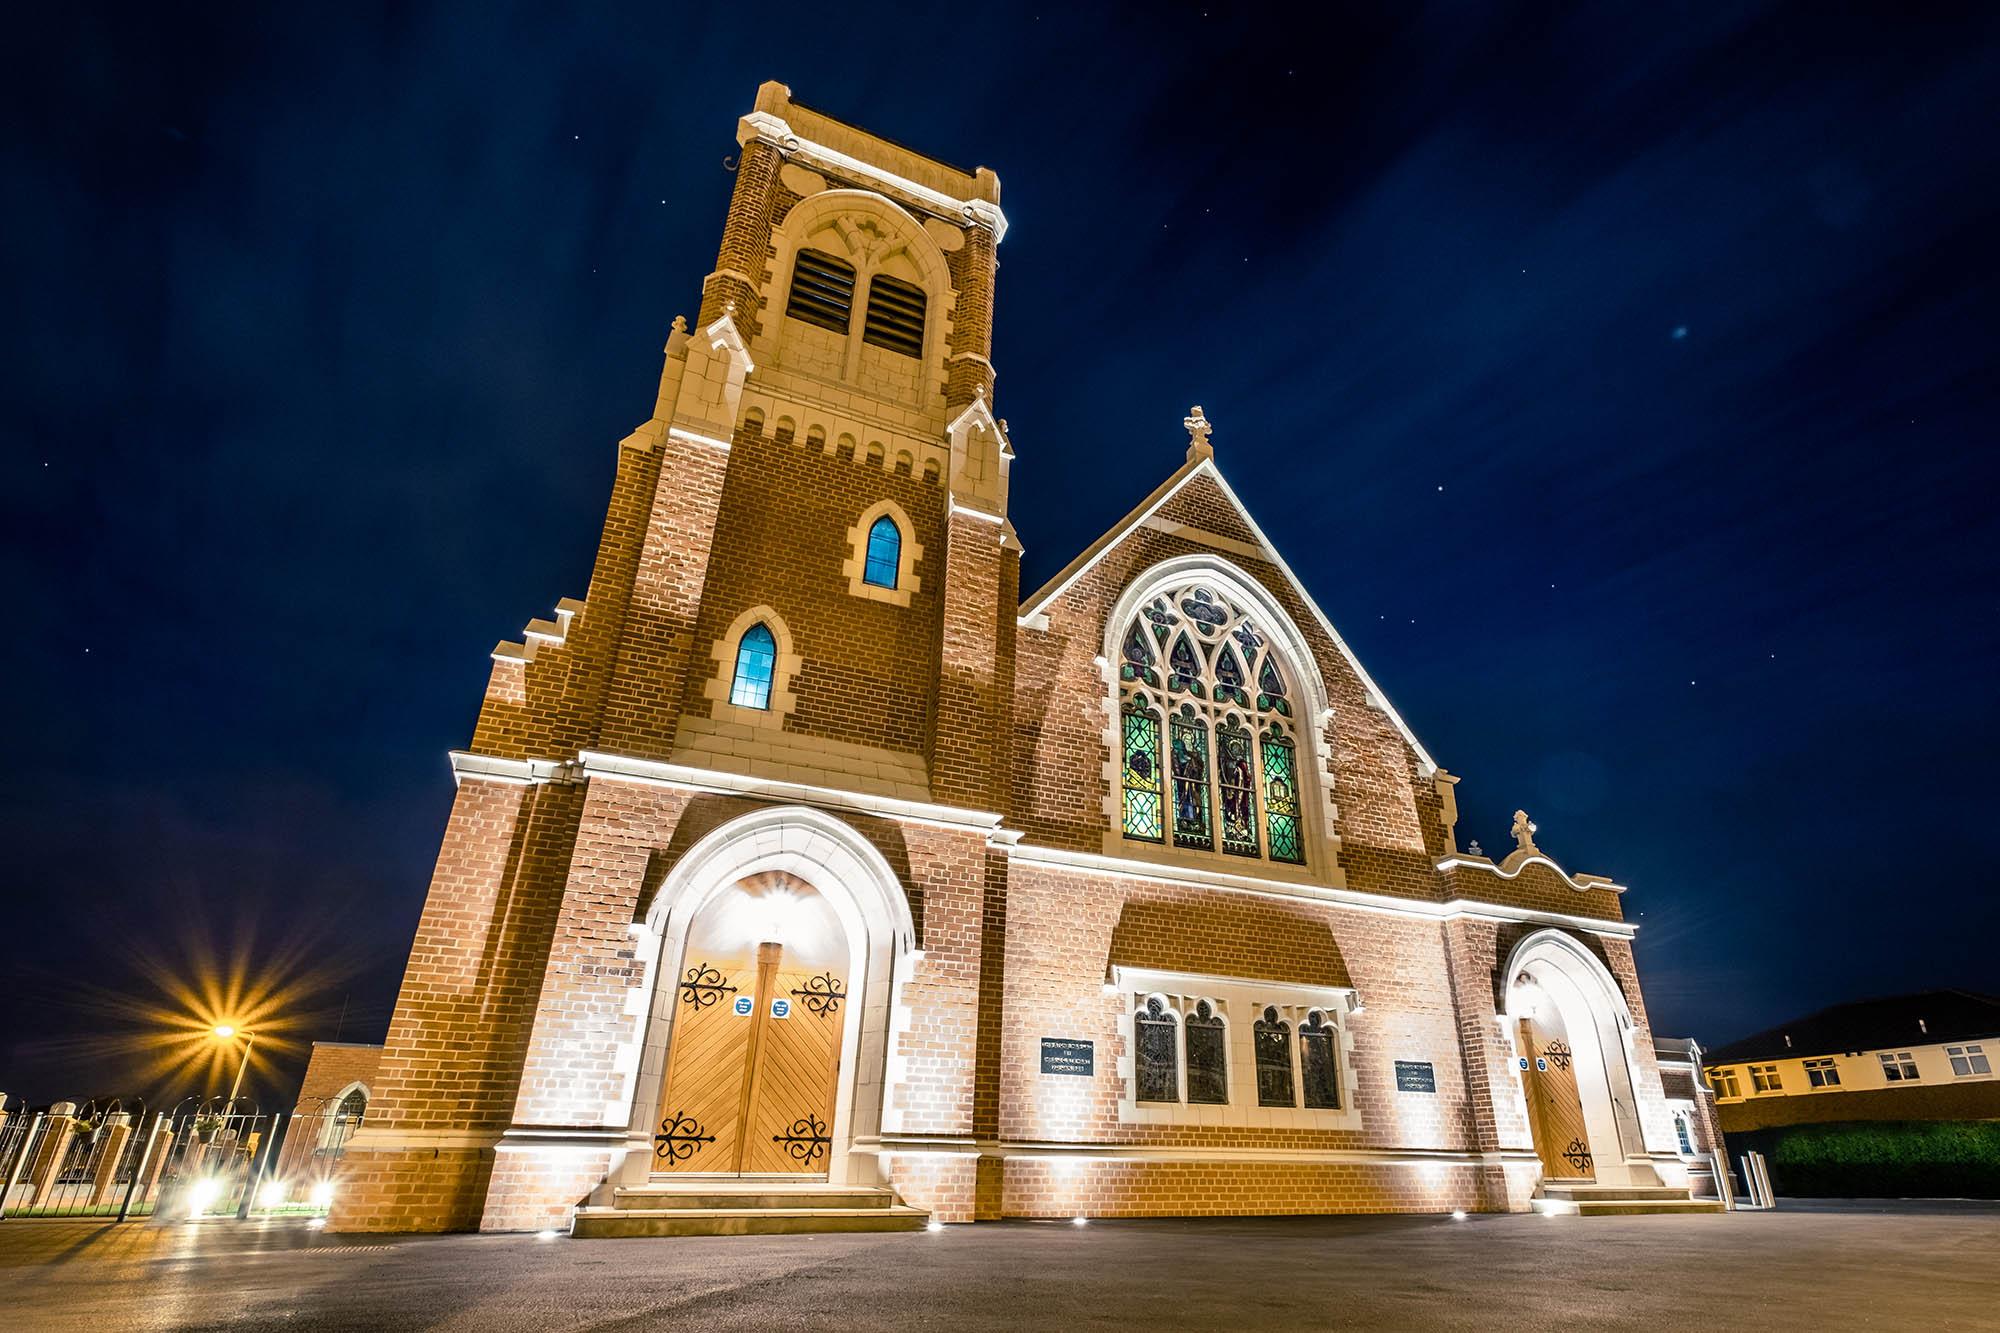 Cregagh Presbyterian Church